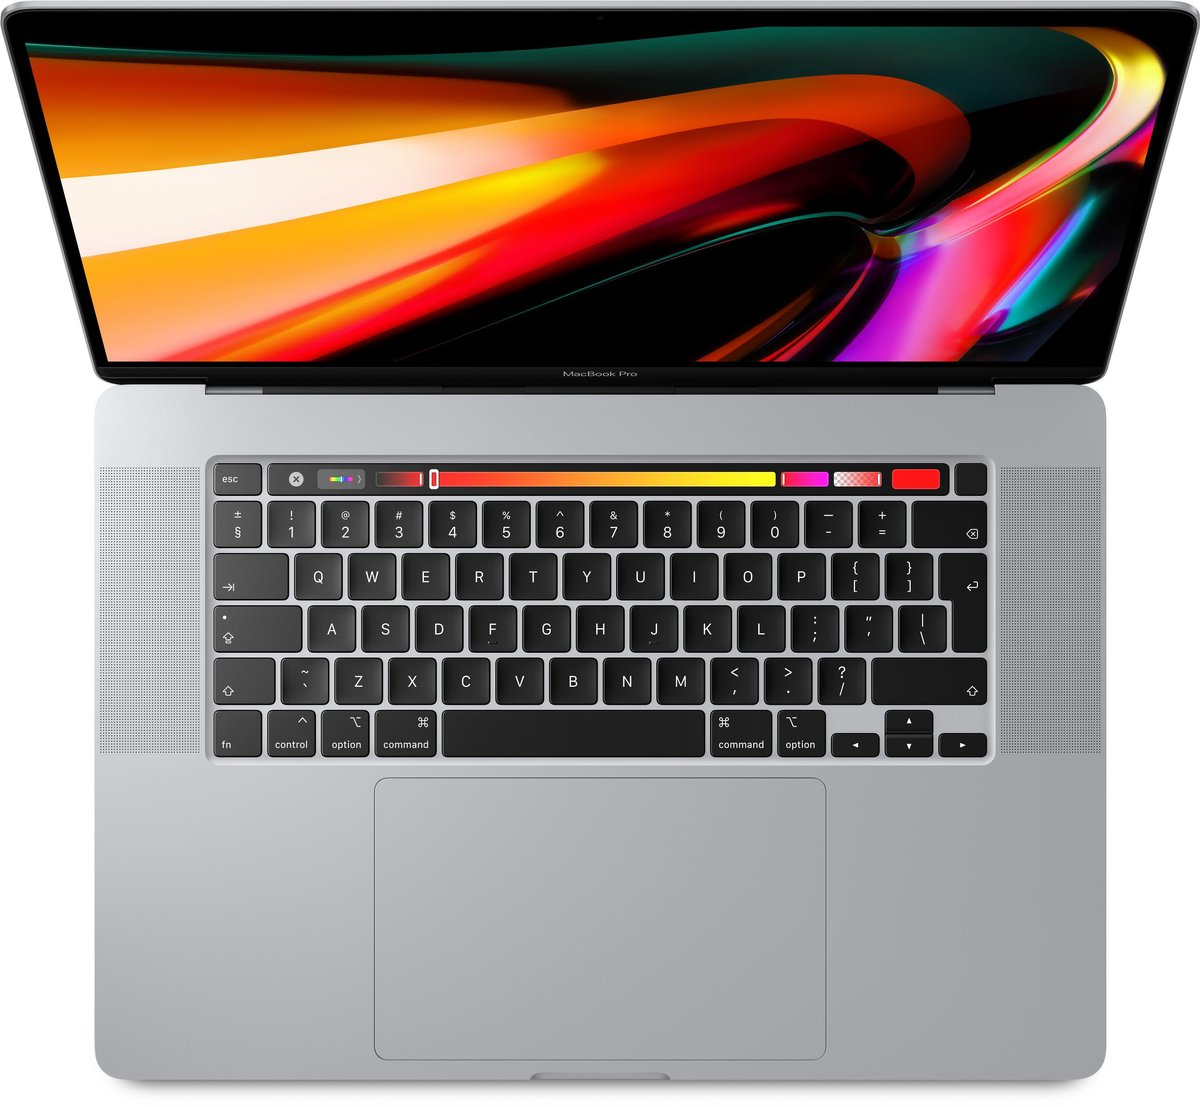 Apple MacBook Pro (2019) Touchbar MVVM2 - 16 inch - intel Core i9 - 1TB- Zilver